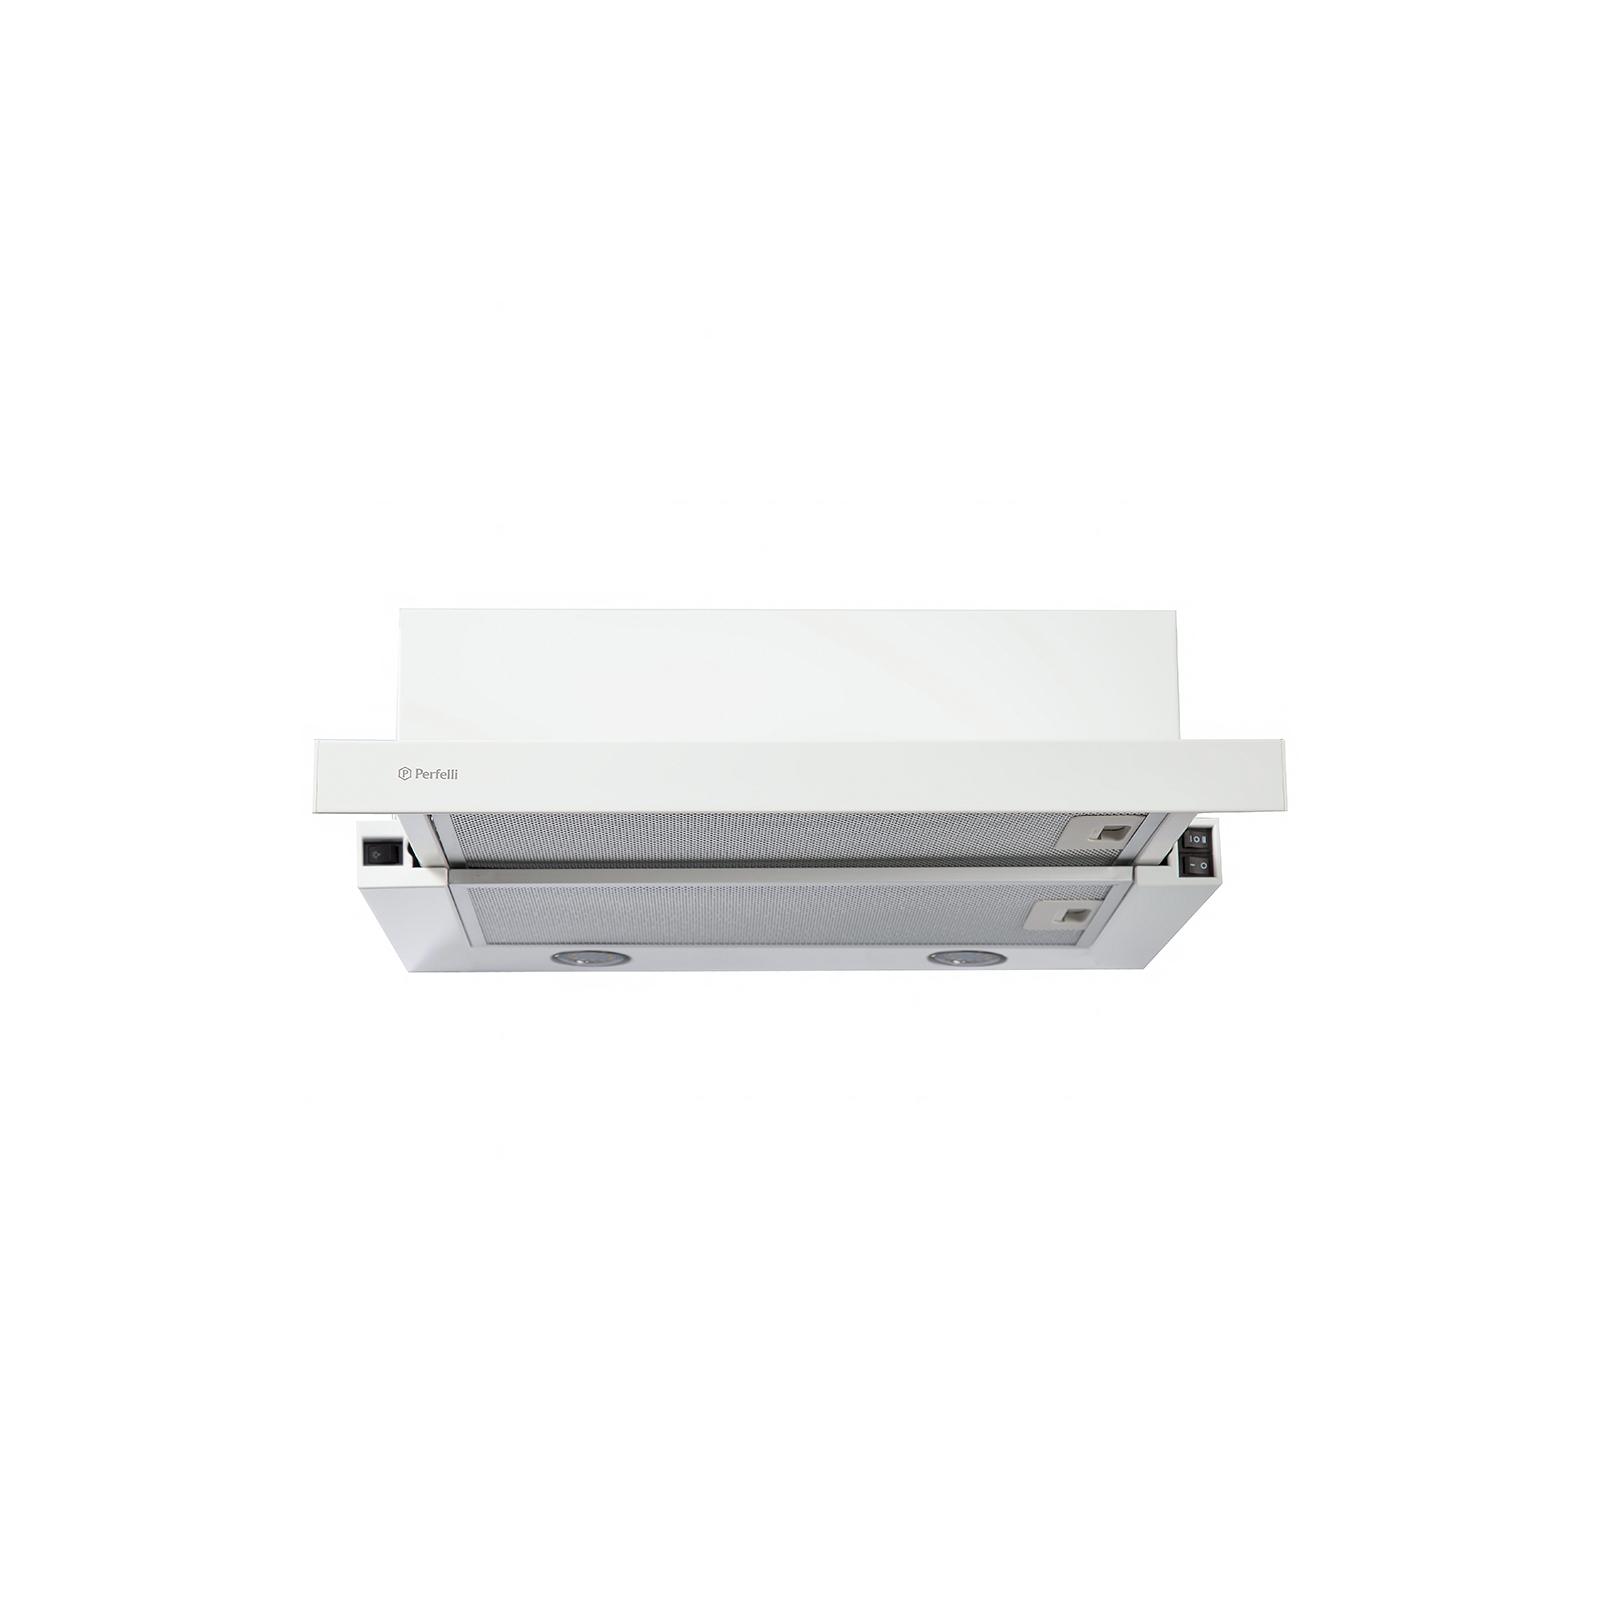 Вытяжка кухонная PERFELLI TL 6612 W LED изображение 2